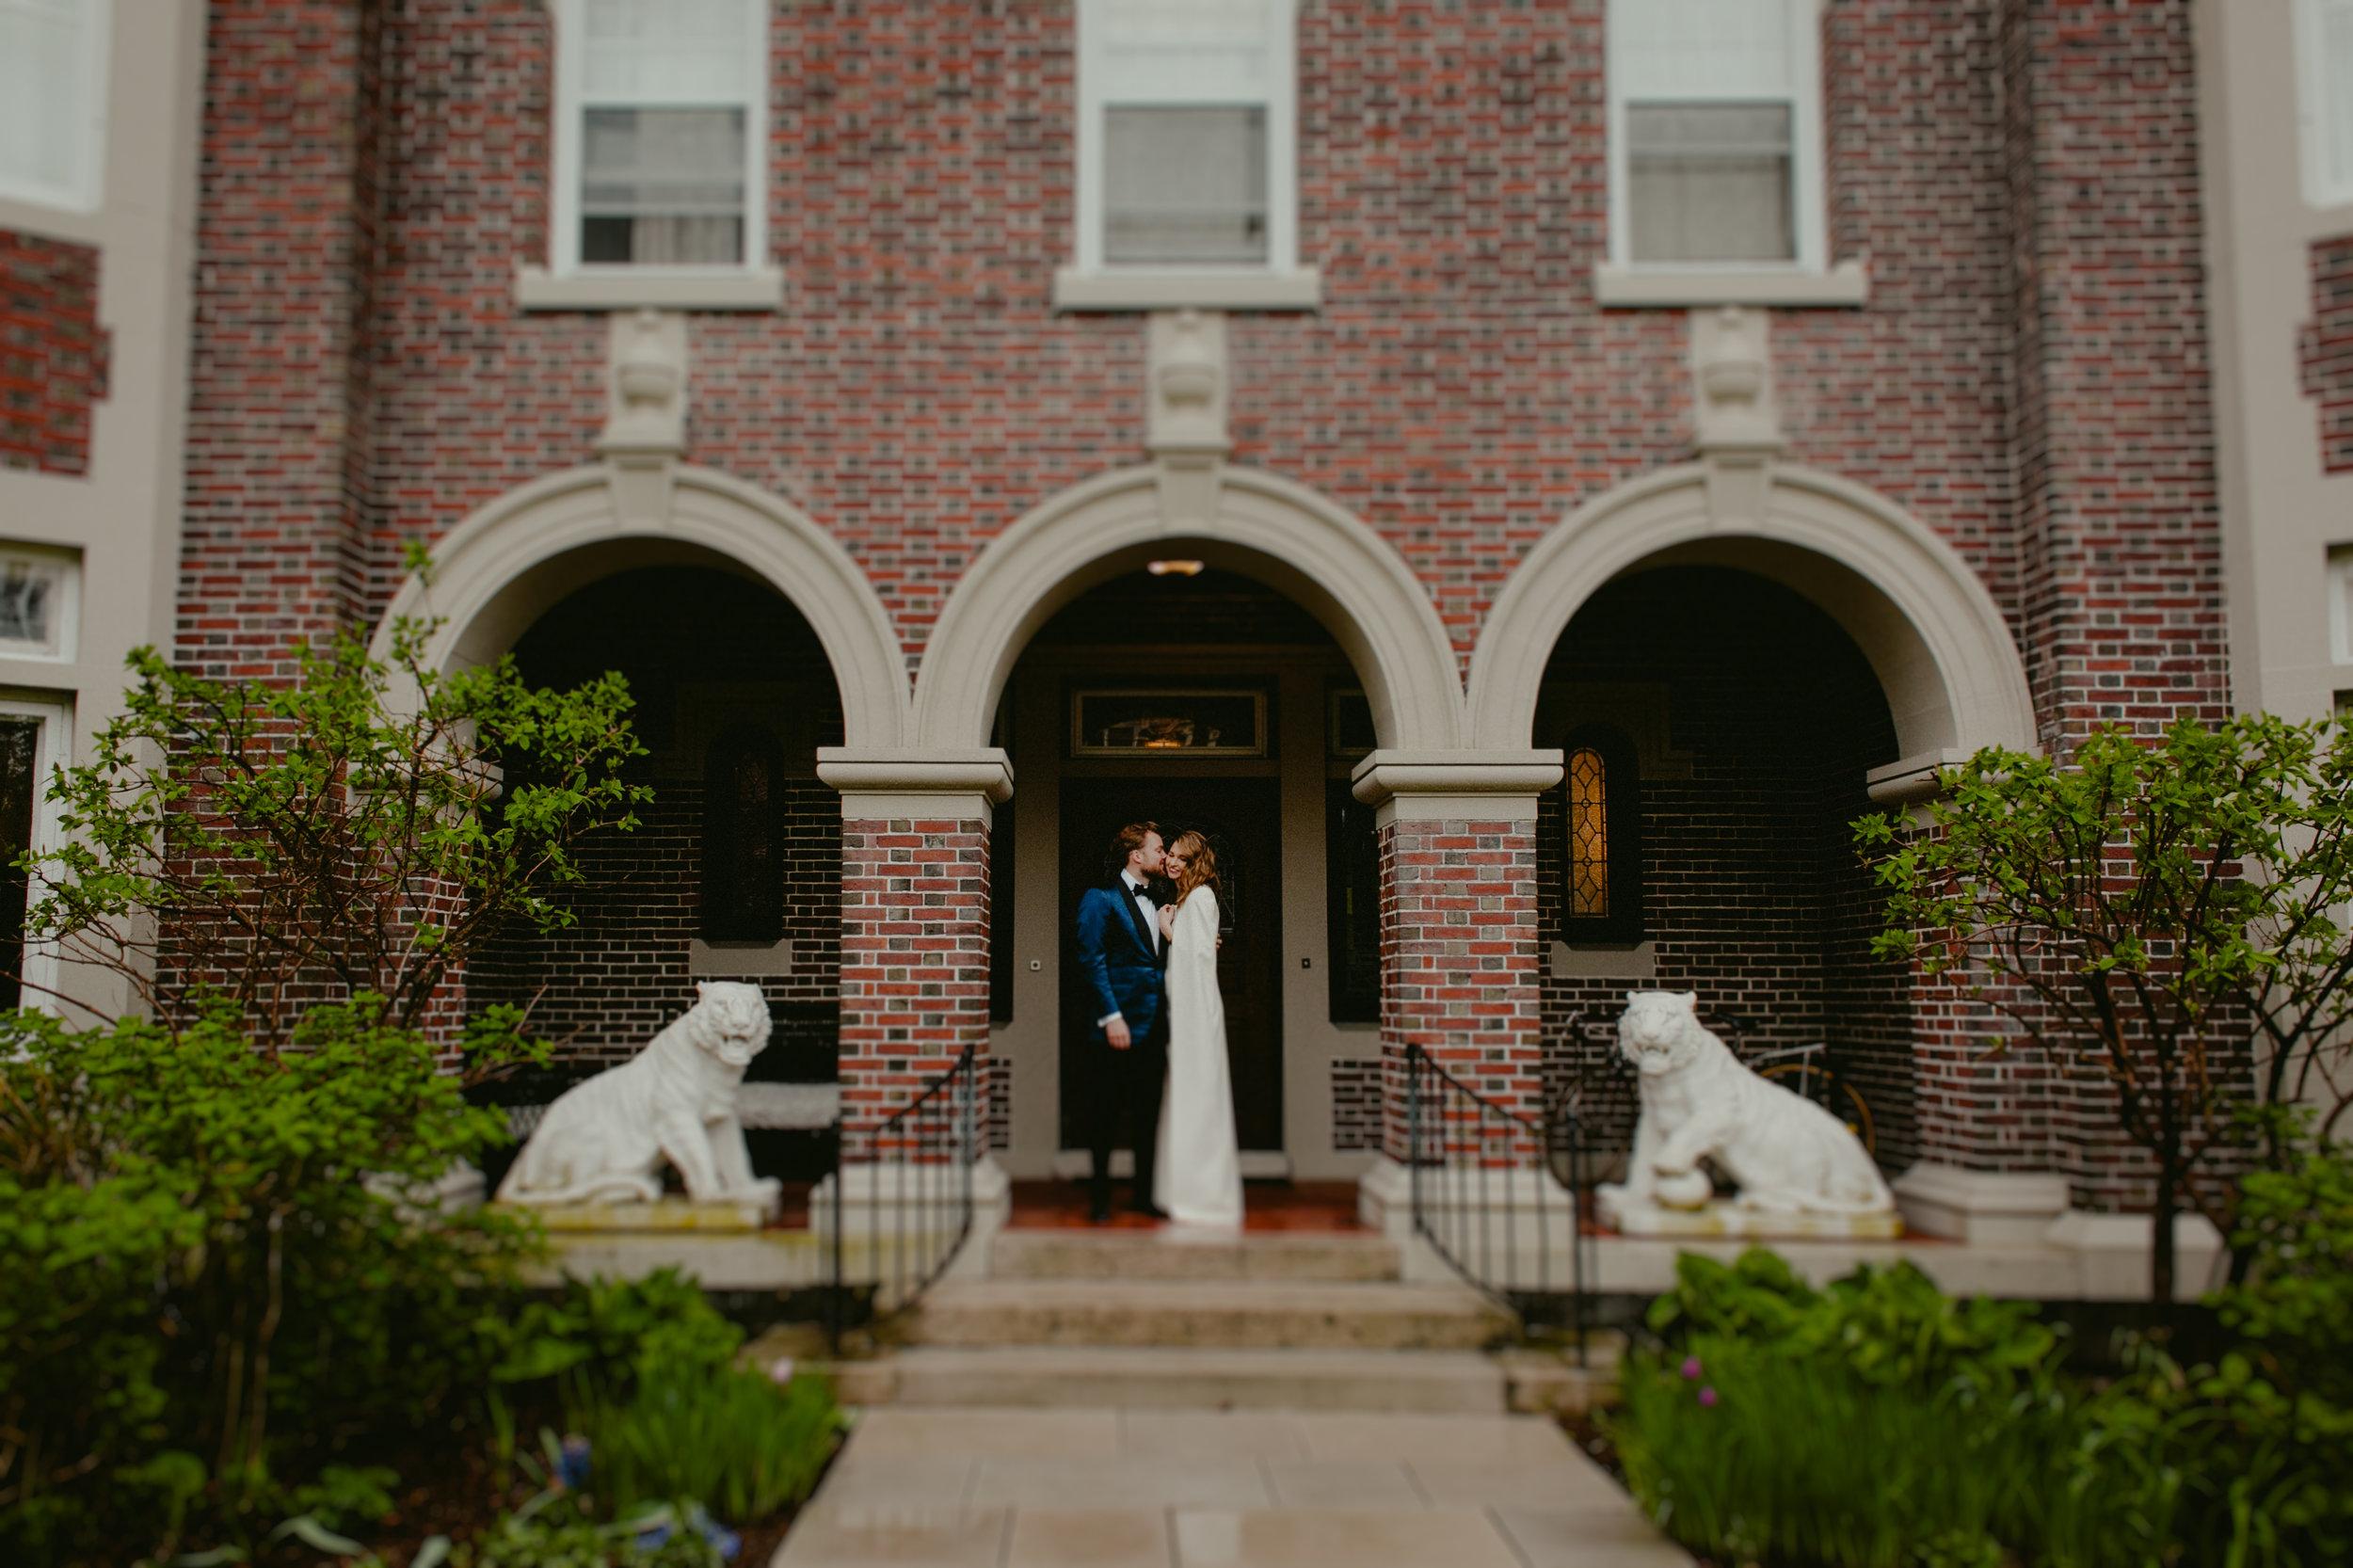 Tiger_House_The_Inn_at_Hudson-Wedding_Chellise_Michael_Photography-318.jpg